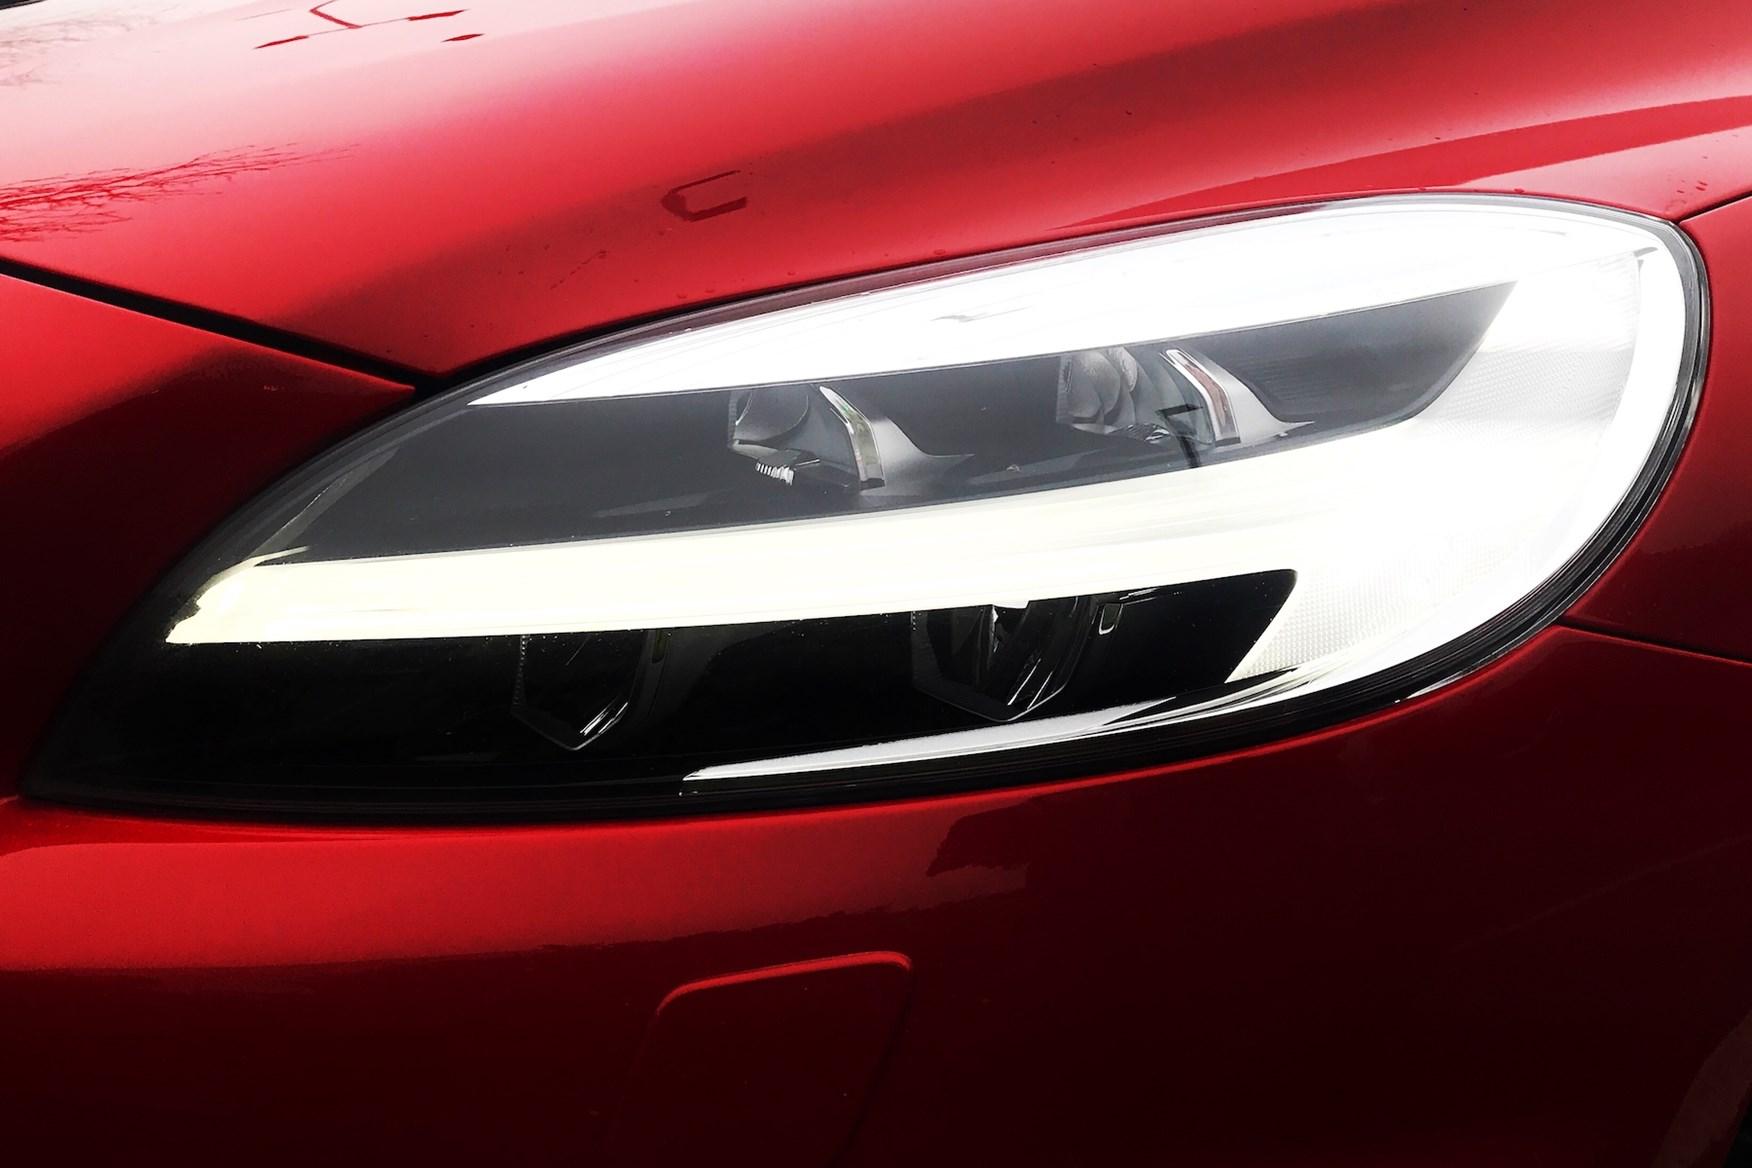 Volvo V40 D4 R-Design Day Running Lights - Passion Red